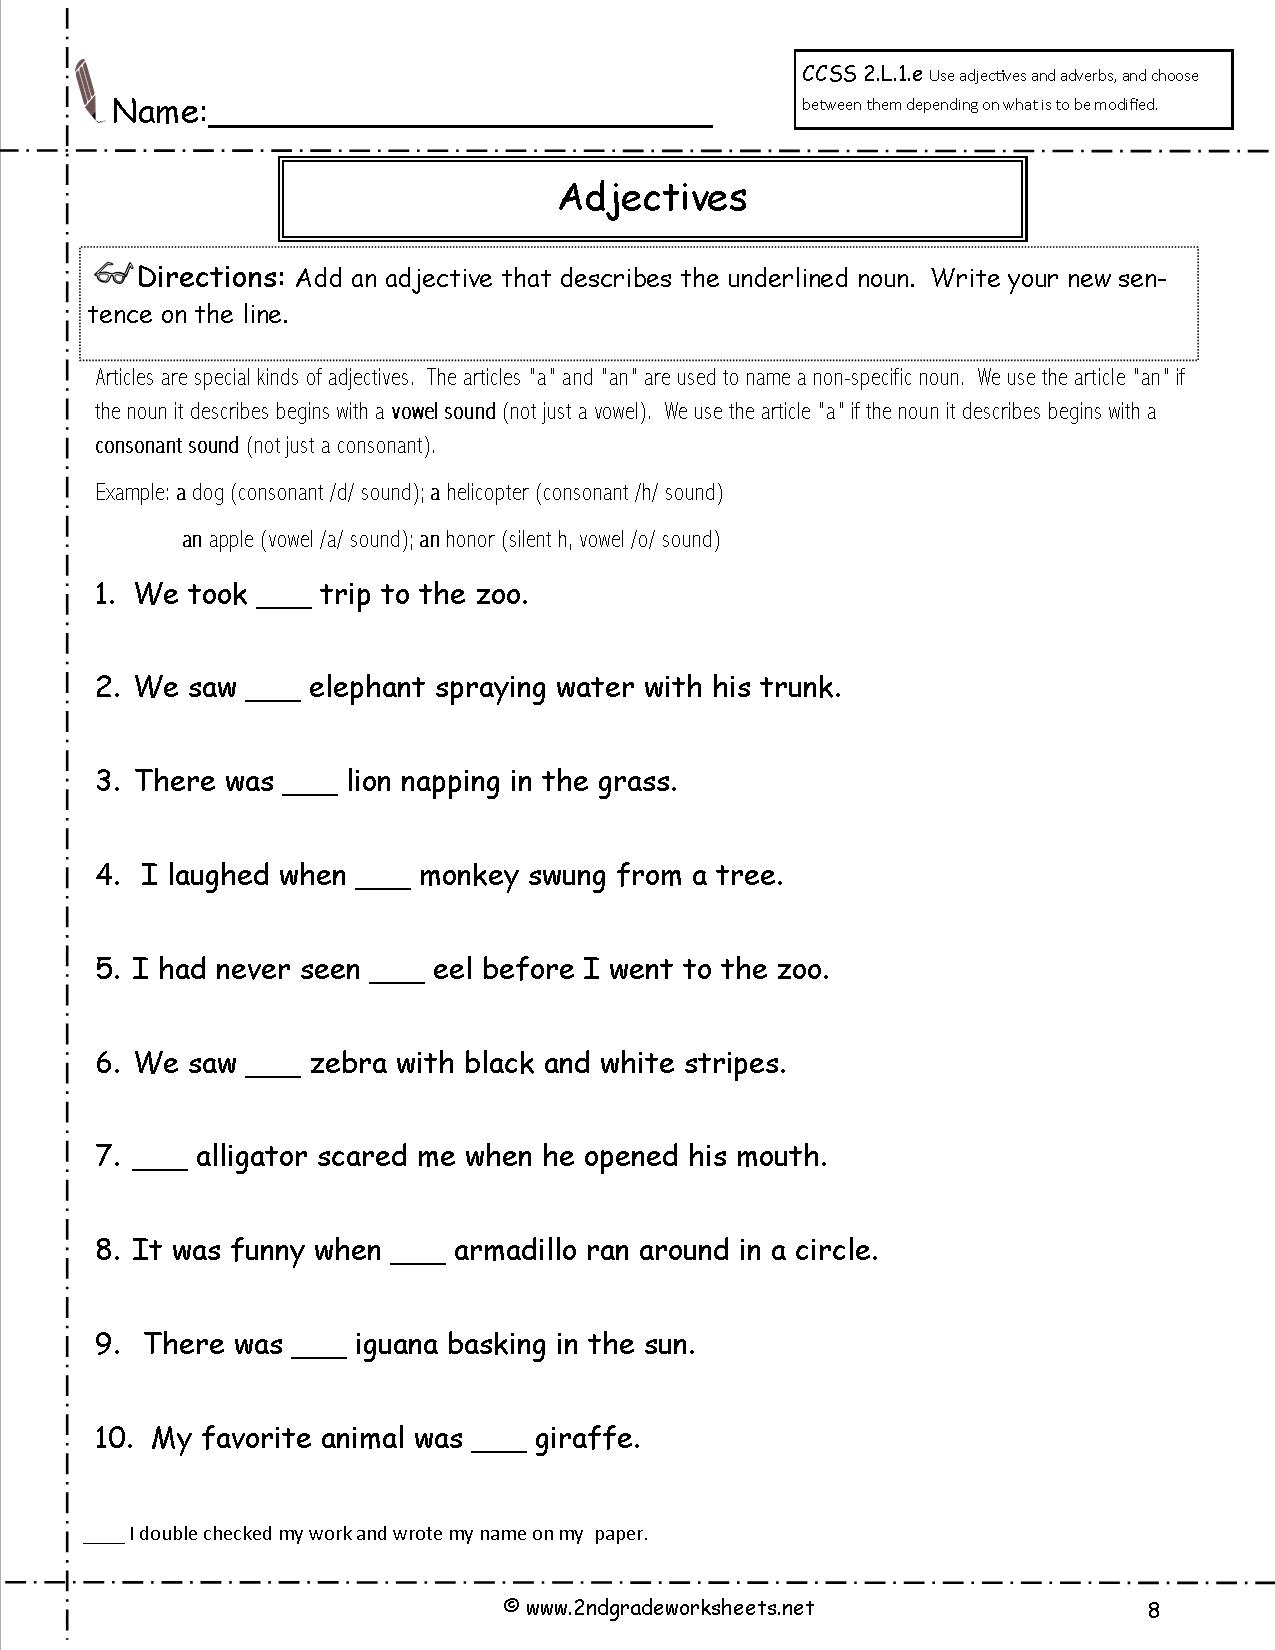 Free Language/grammar Worksheets And Printouts | Second Grade Printable Worksheets